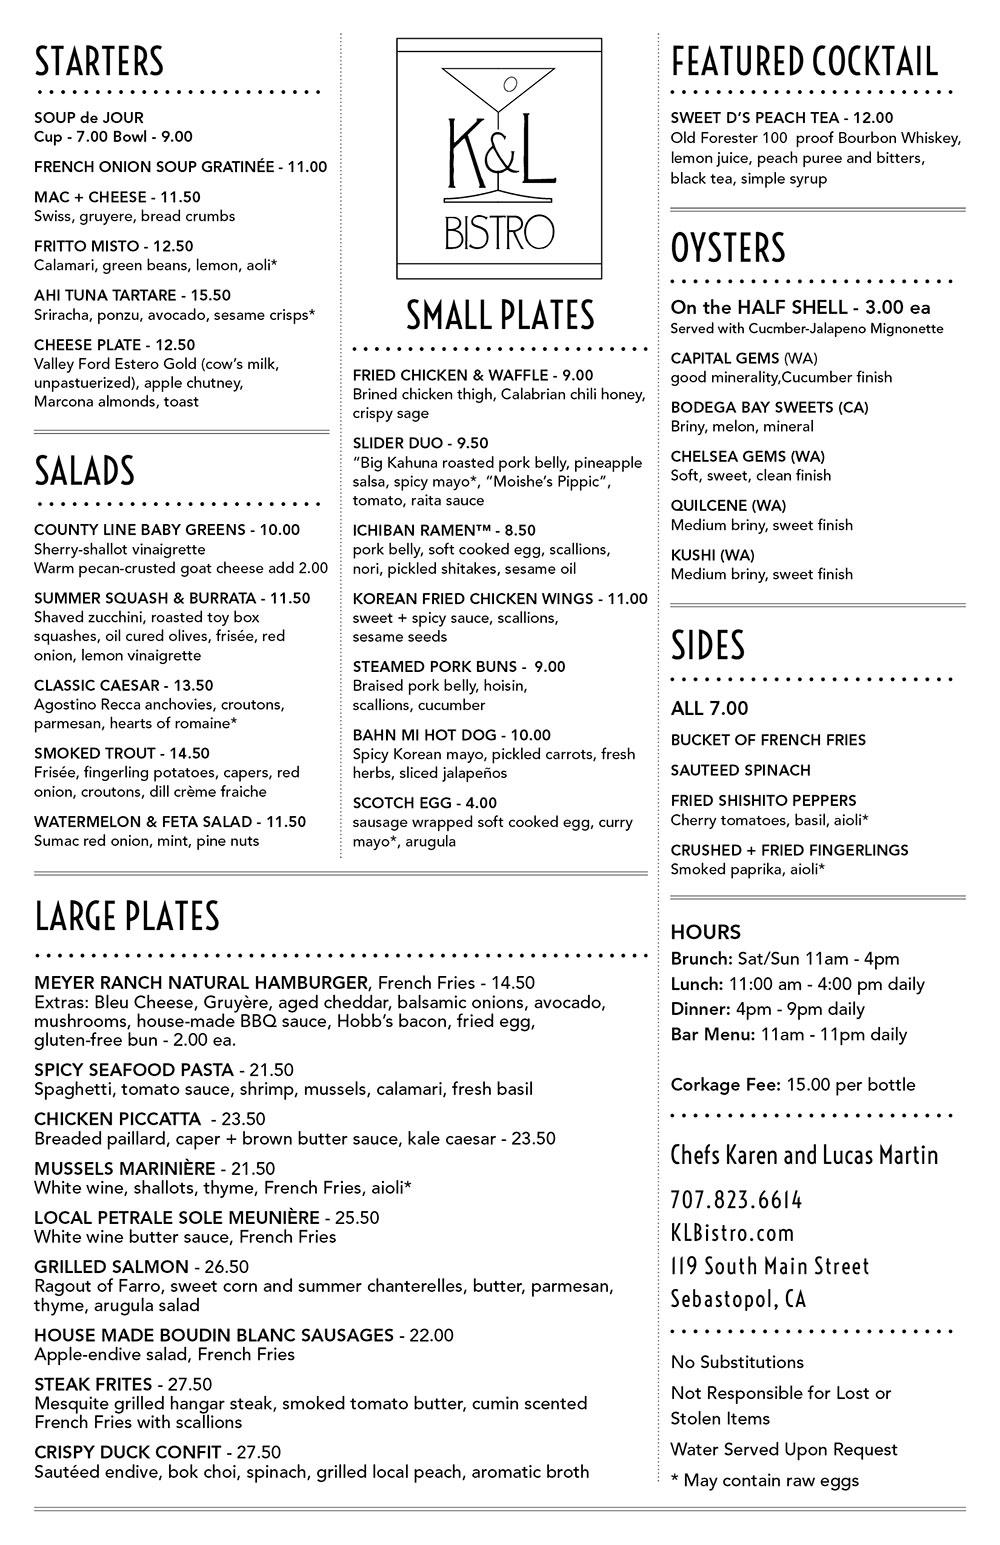 K&L Bistro menu